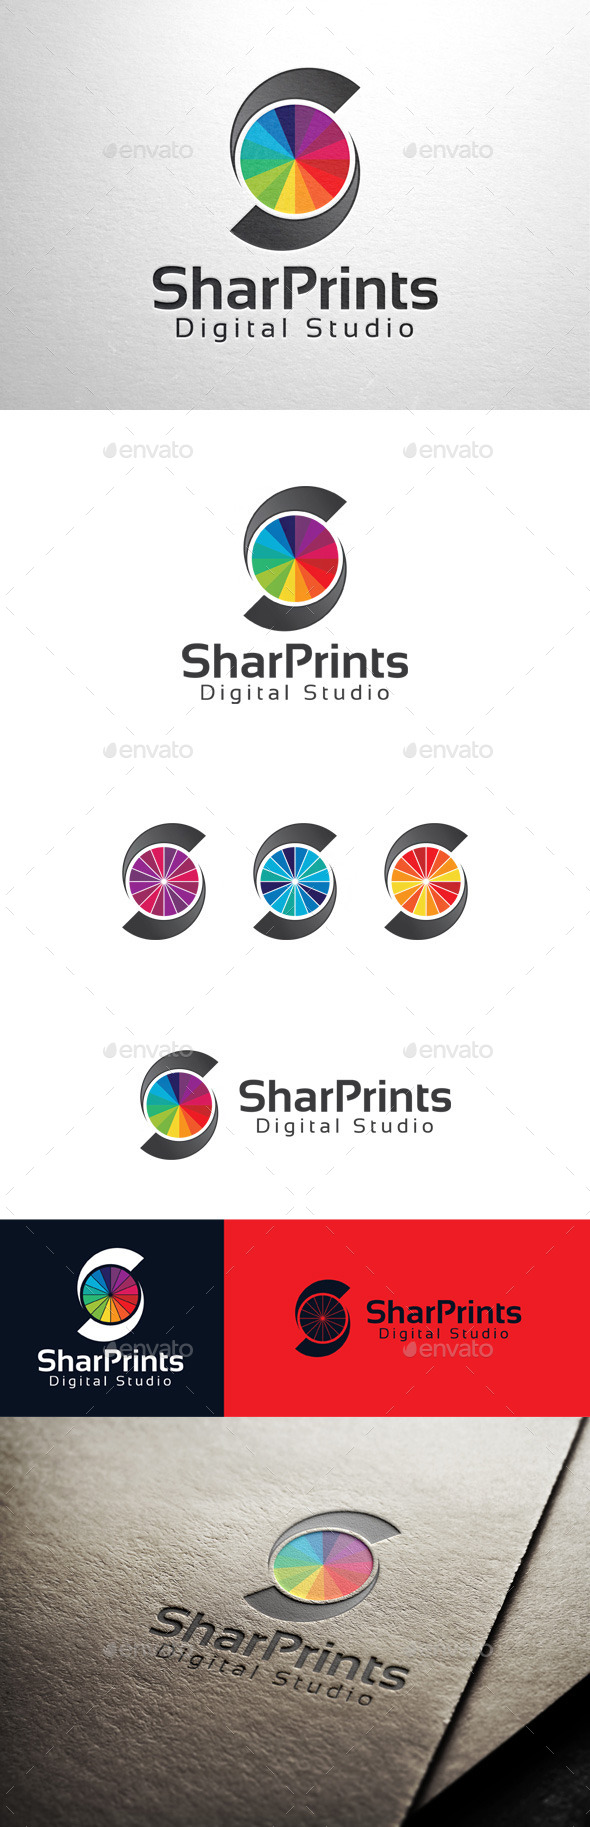 GraphicRiver Shar Prints Letter S Logo 11383535